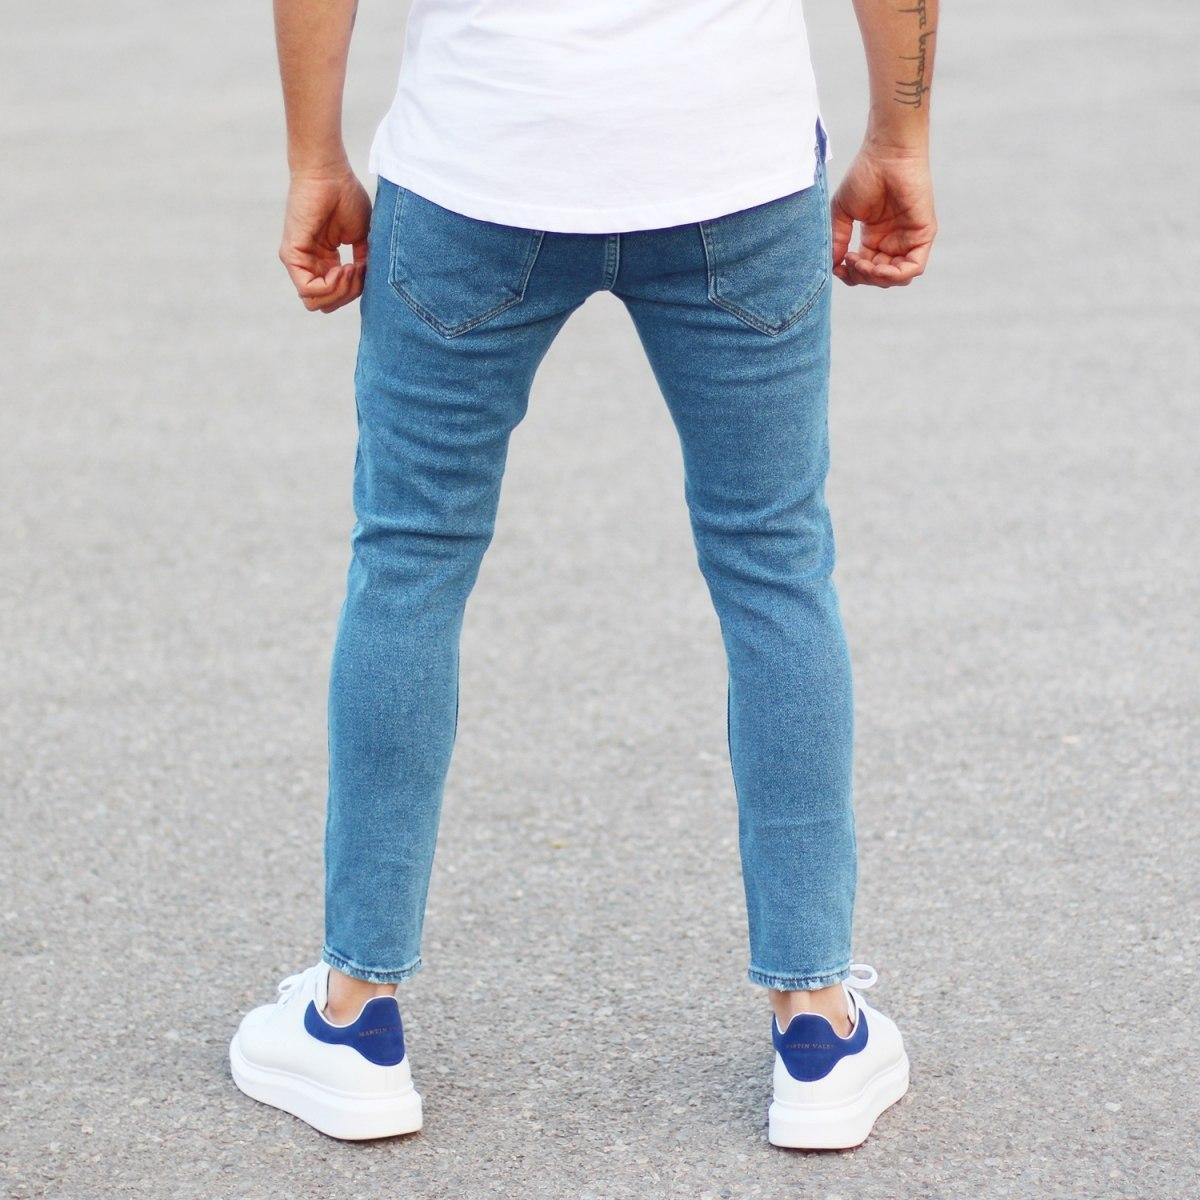 Men's Basic Fit Jeans In Blue Mv Premium Brand - 4